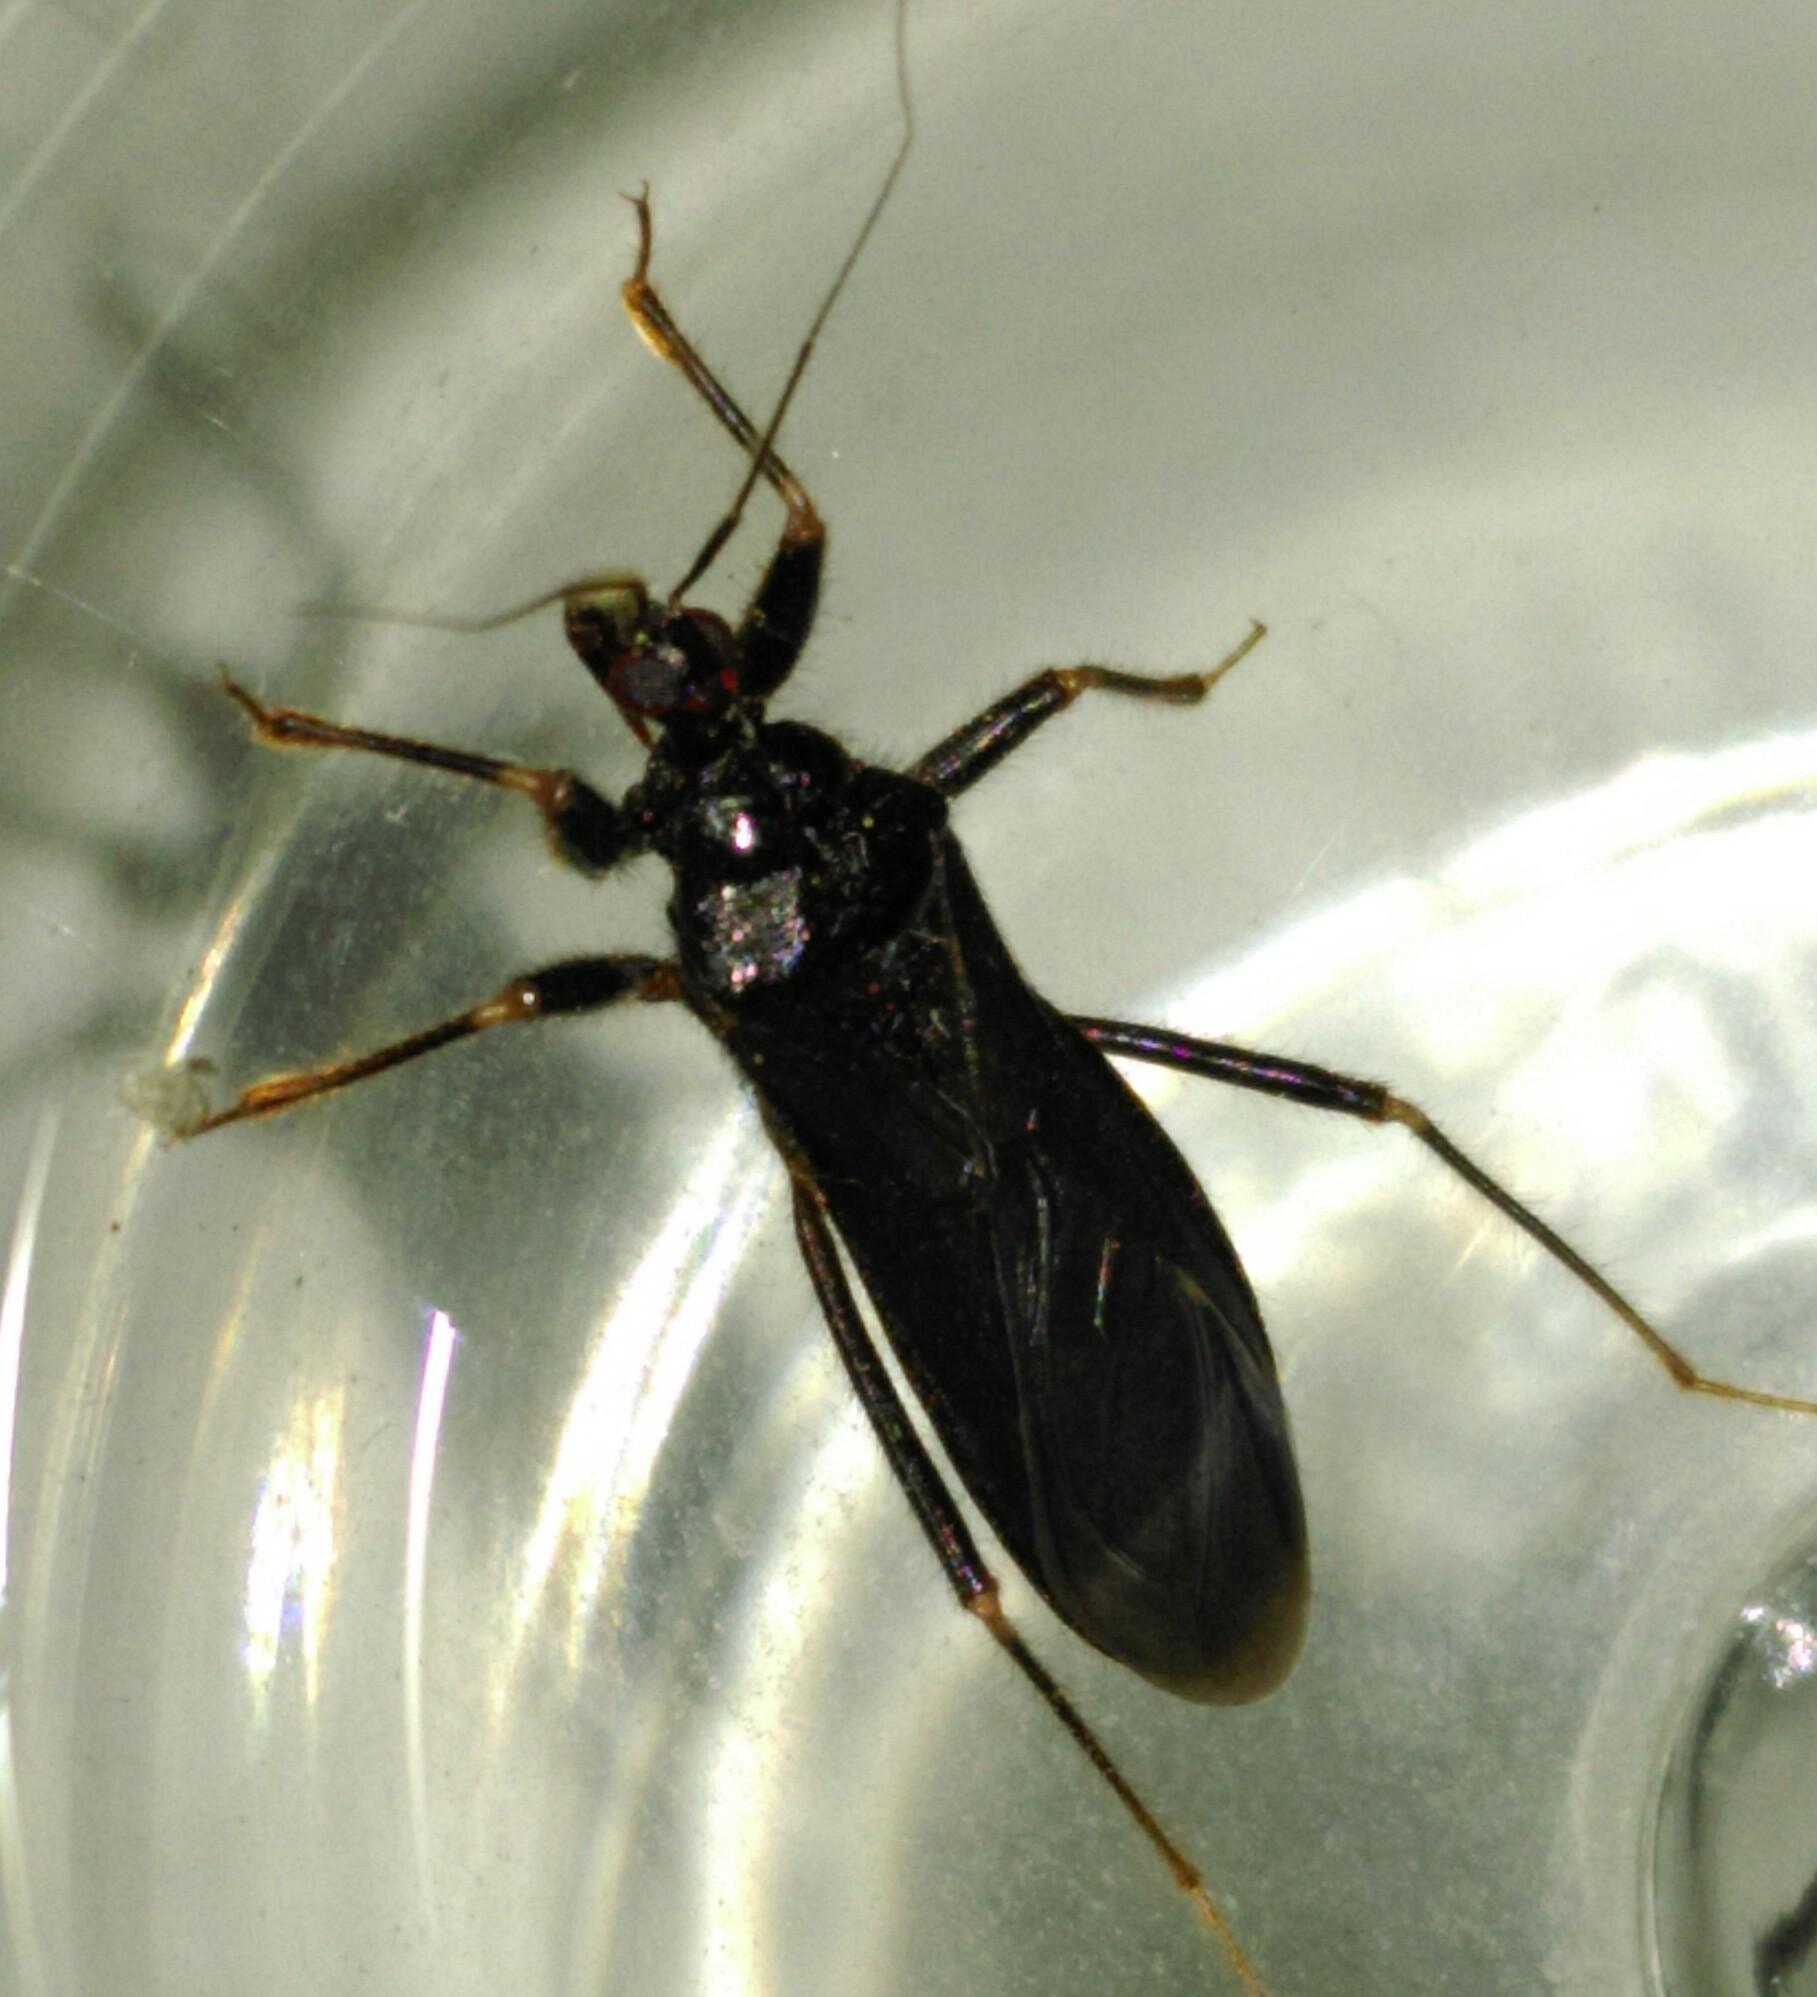 fliegender k fer um welche art handelt es sich hier tiere natur insekten. Black Bedroom Furniture Sets. Home Design Ideas